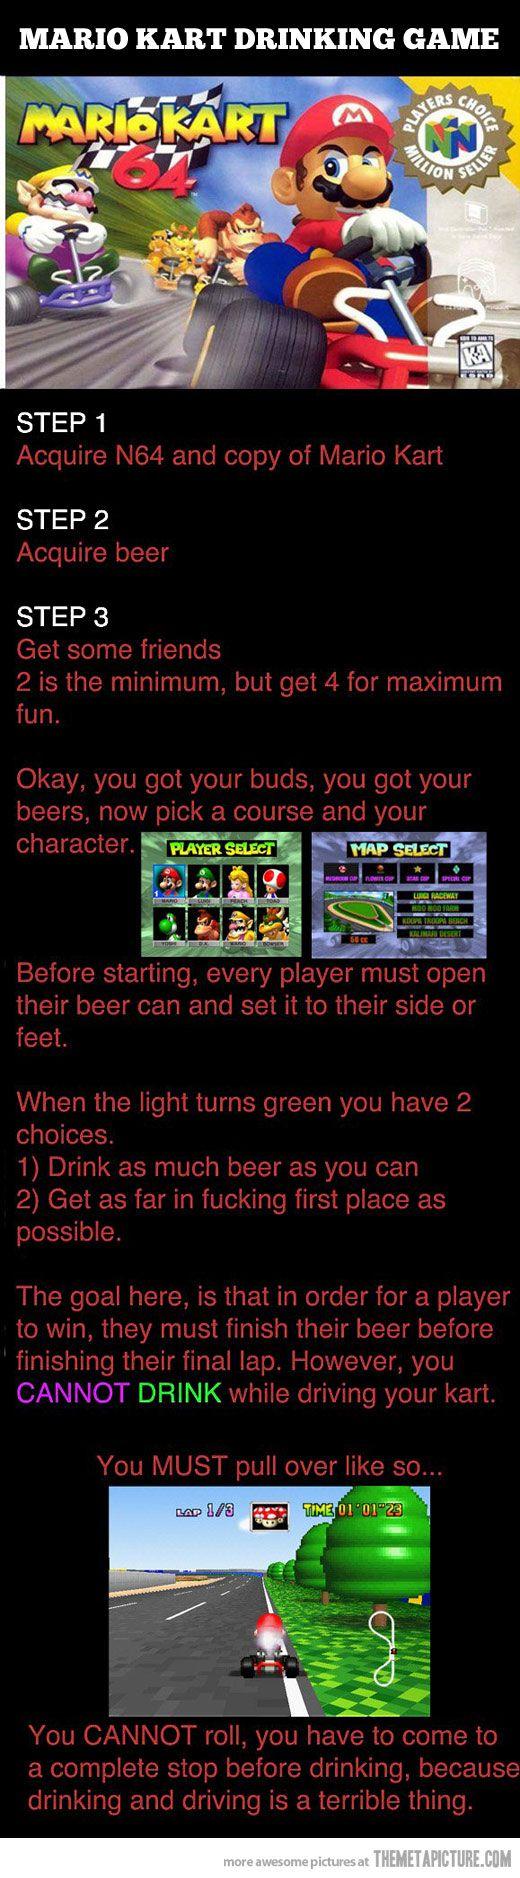 Mario Drinking Game - Seems legit.